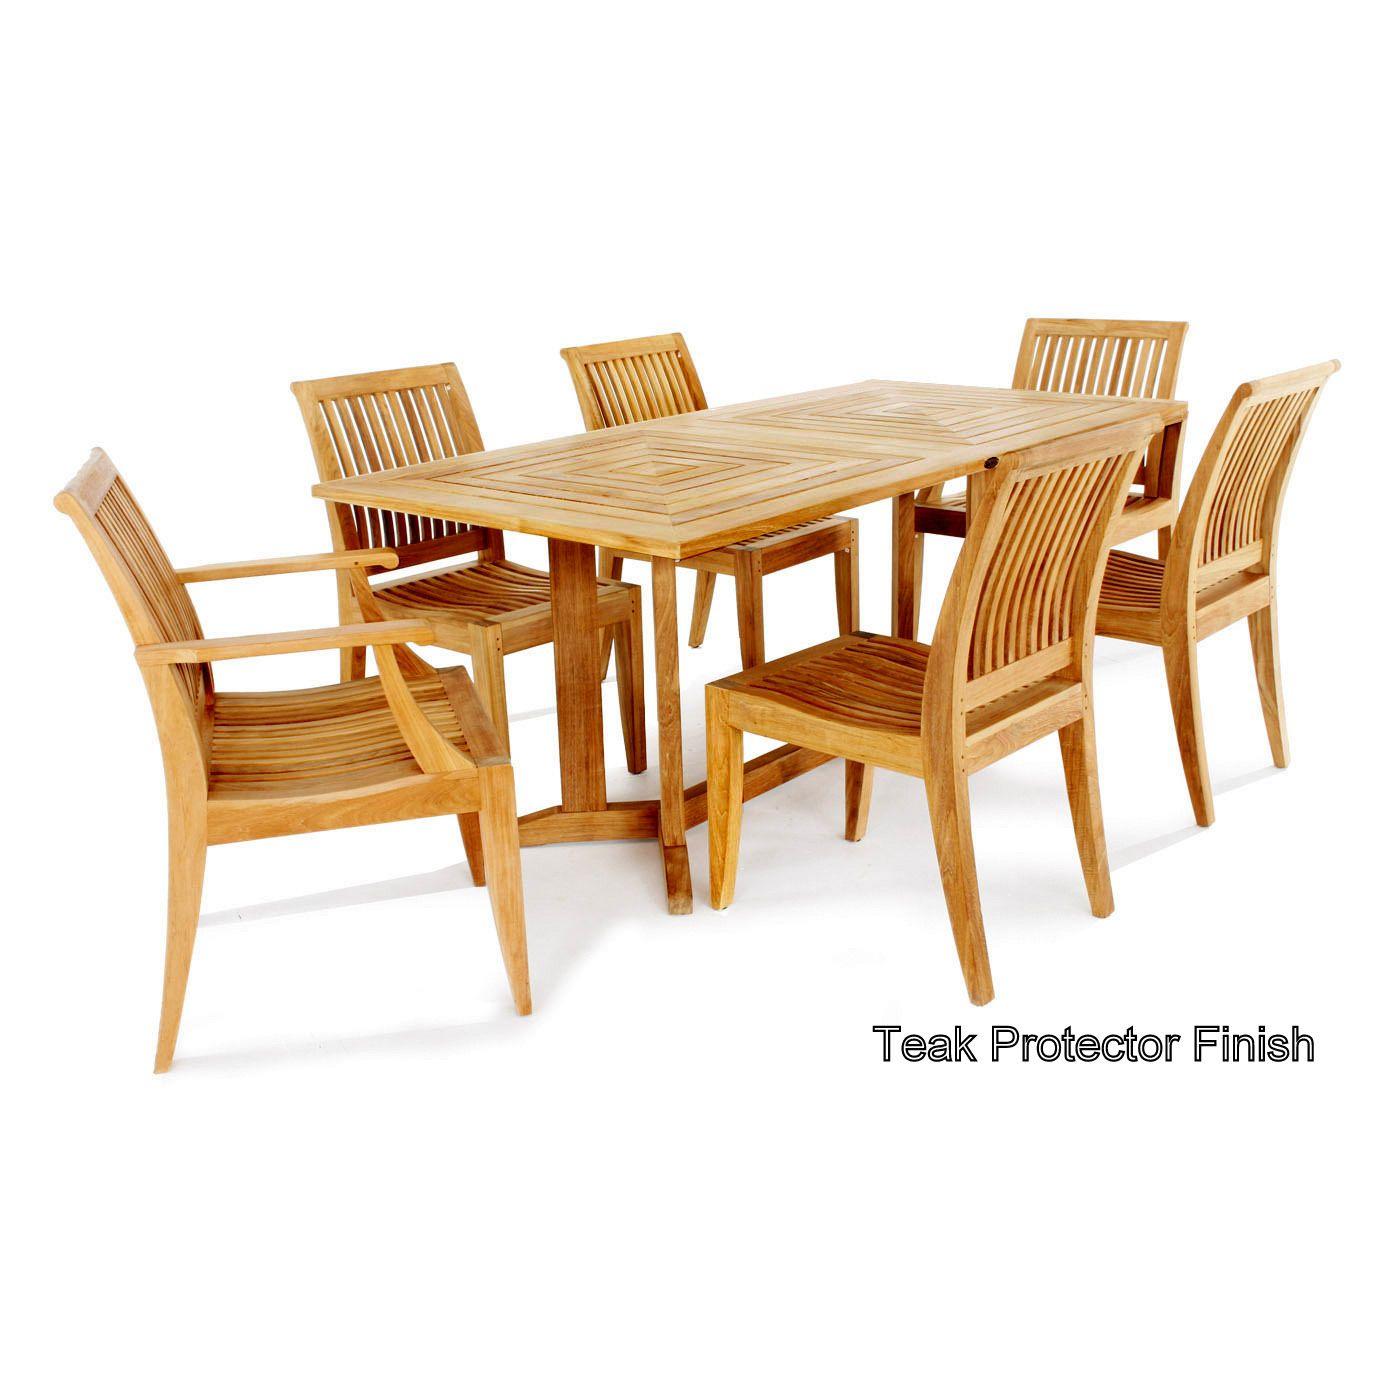 Teak Dining Sets Seating For 6 To 8 Westminster Teak Furniture Westminster Teak Outdoor Furniture Sets Teak